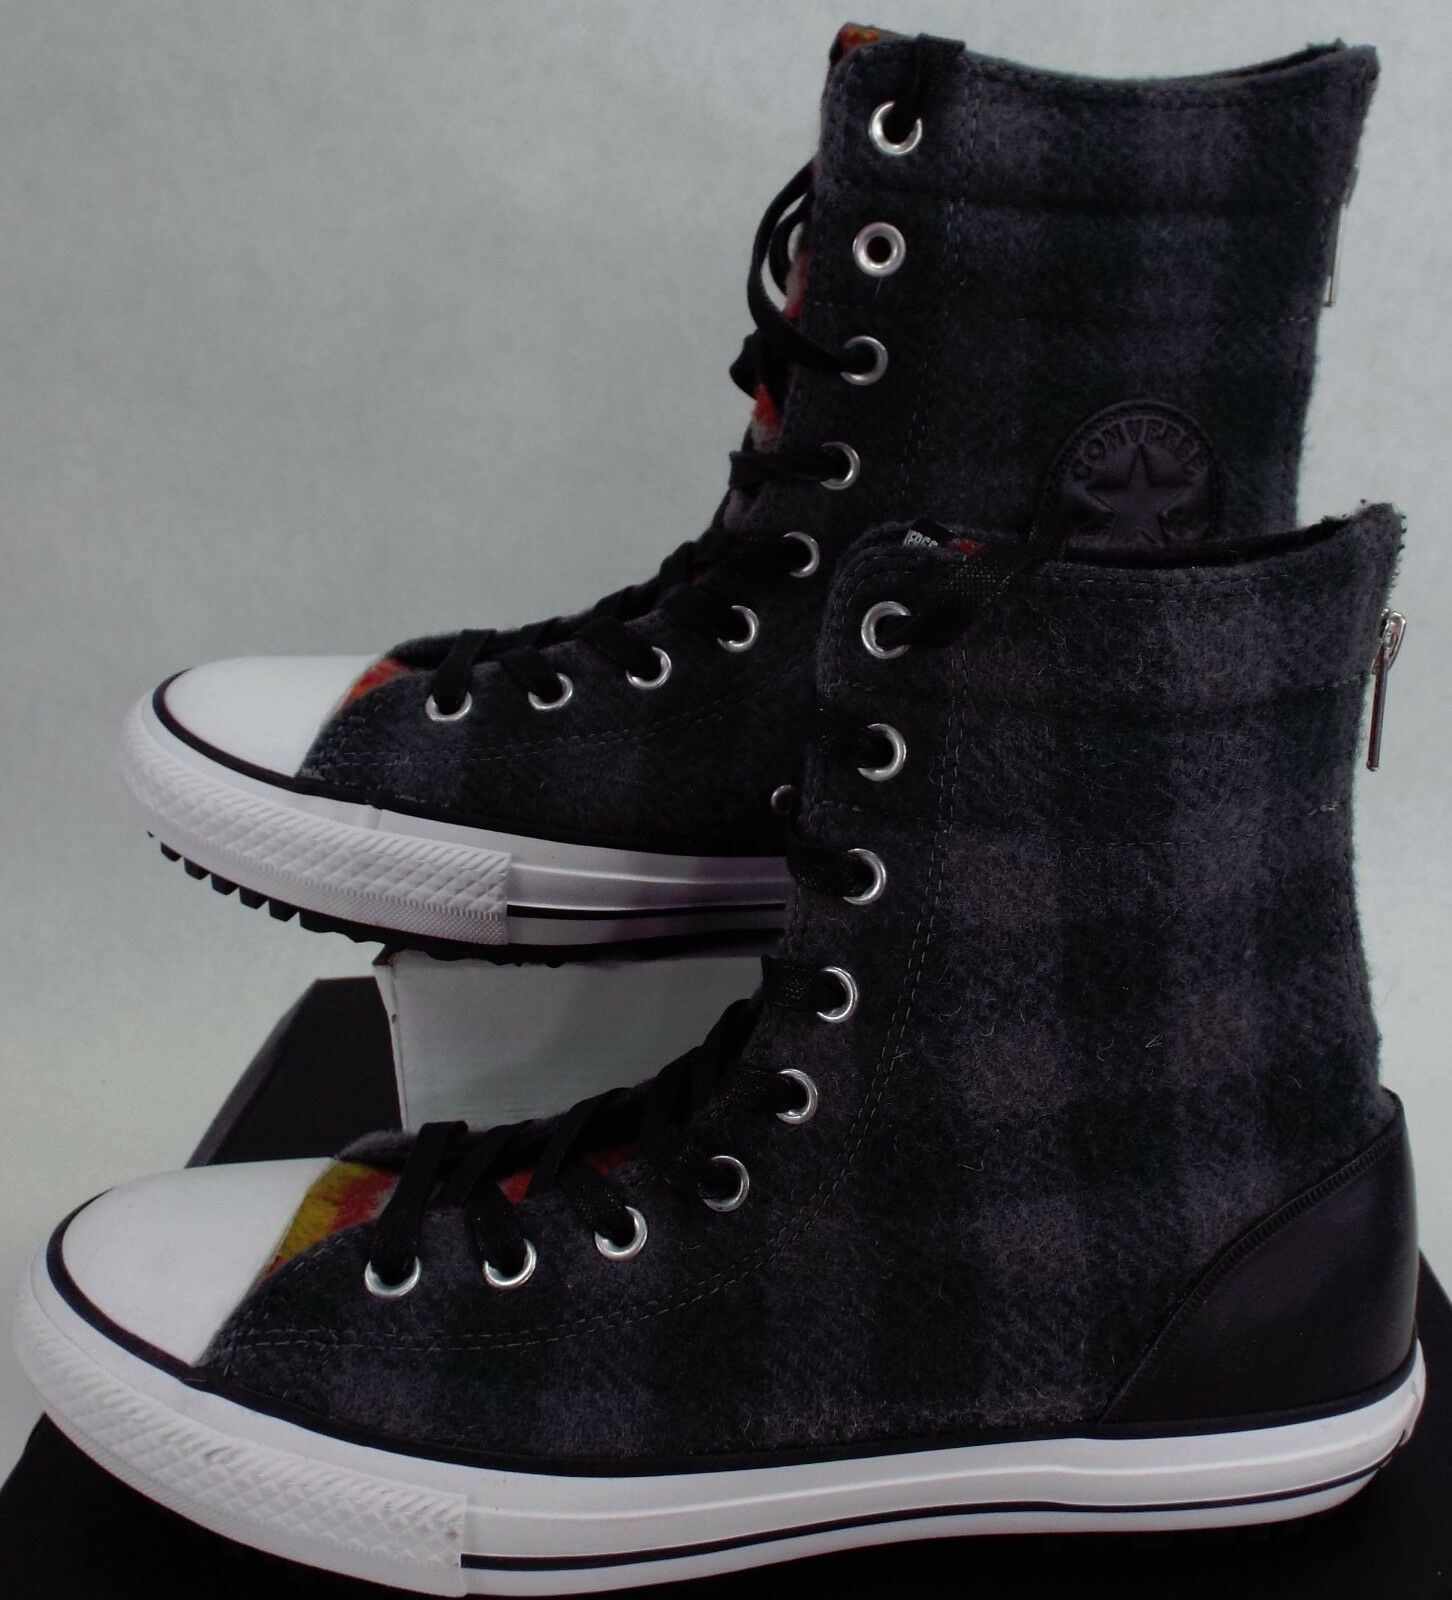 New Hi Damenschuhe CONVERSE 11 CT Hi New Rise Wool Winter Stiefel Plaid Schuhes 90 549686C 241f20